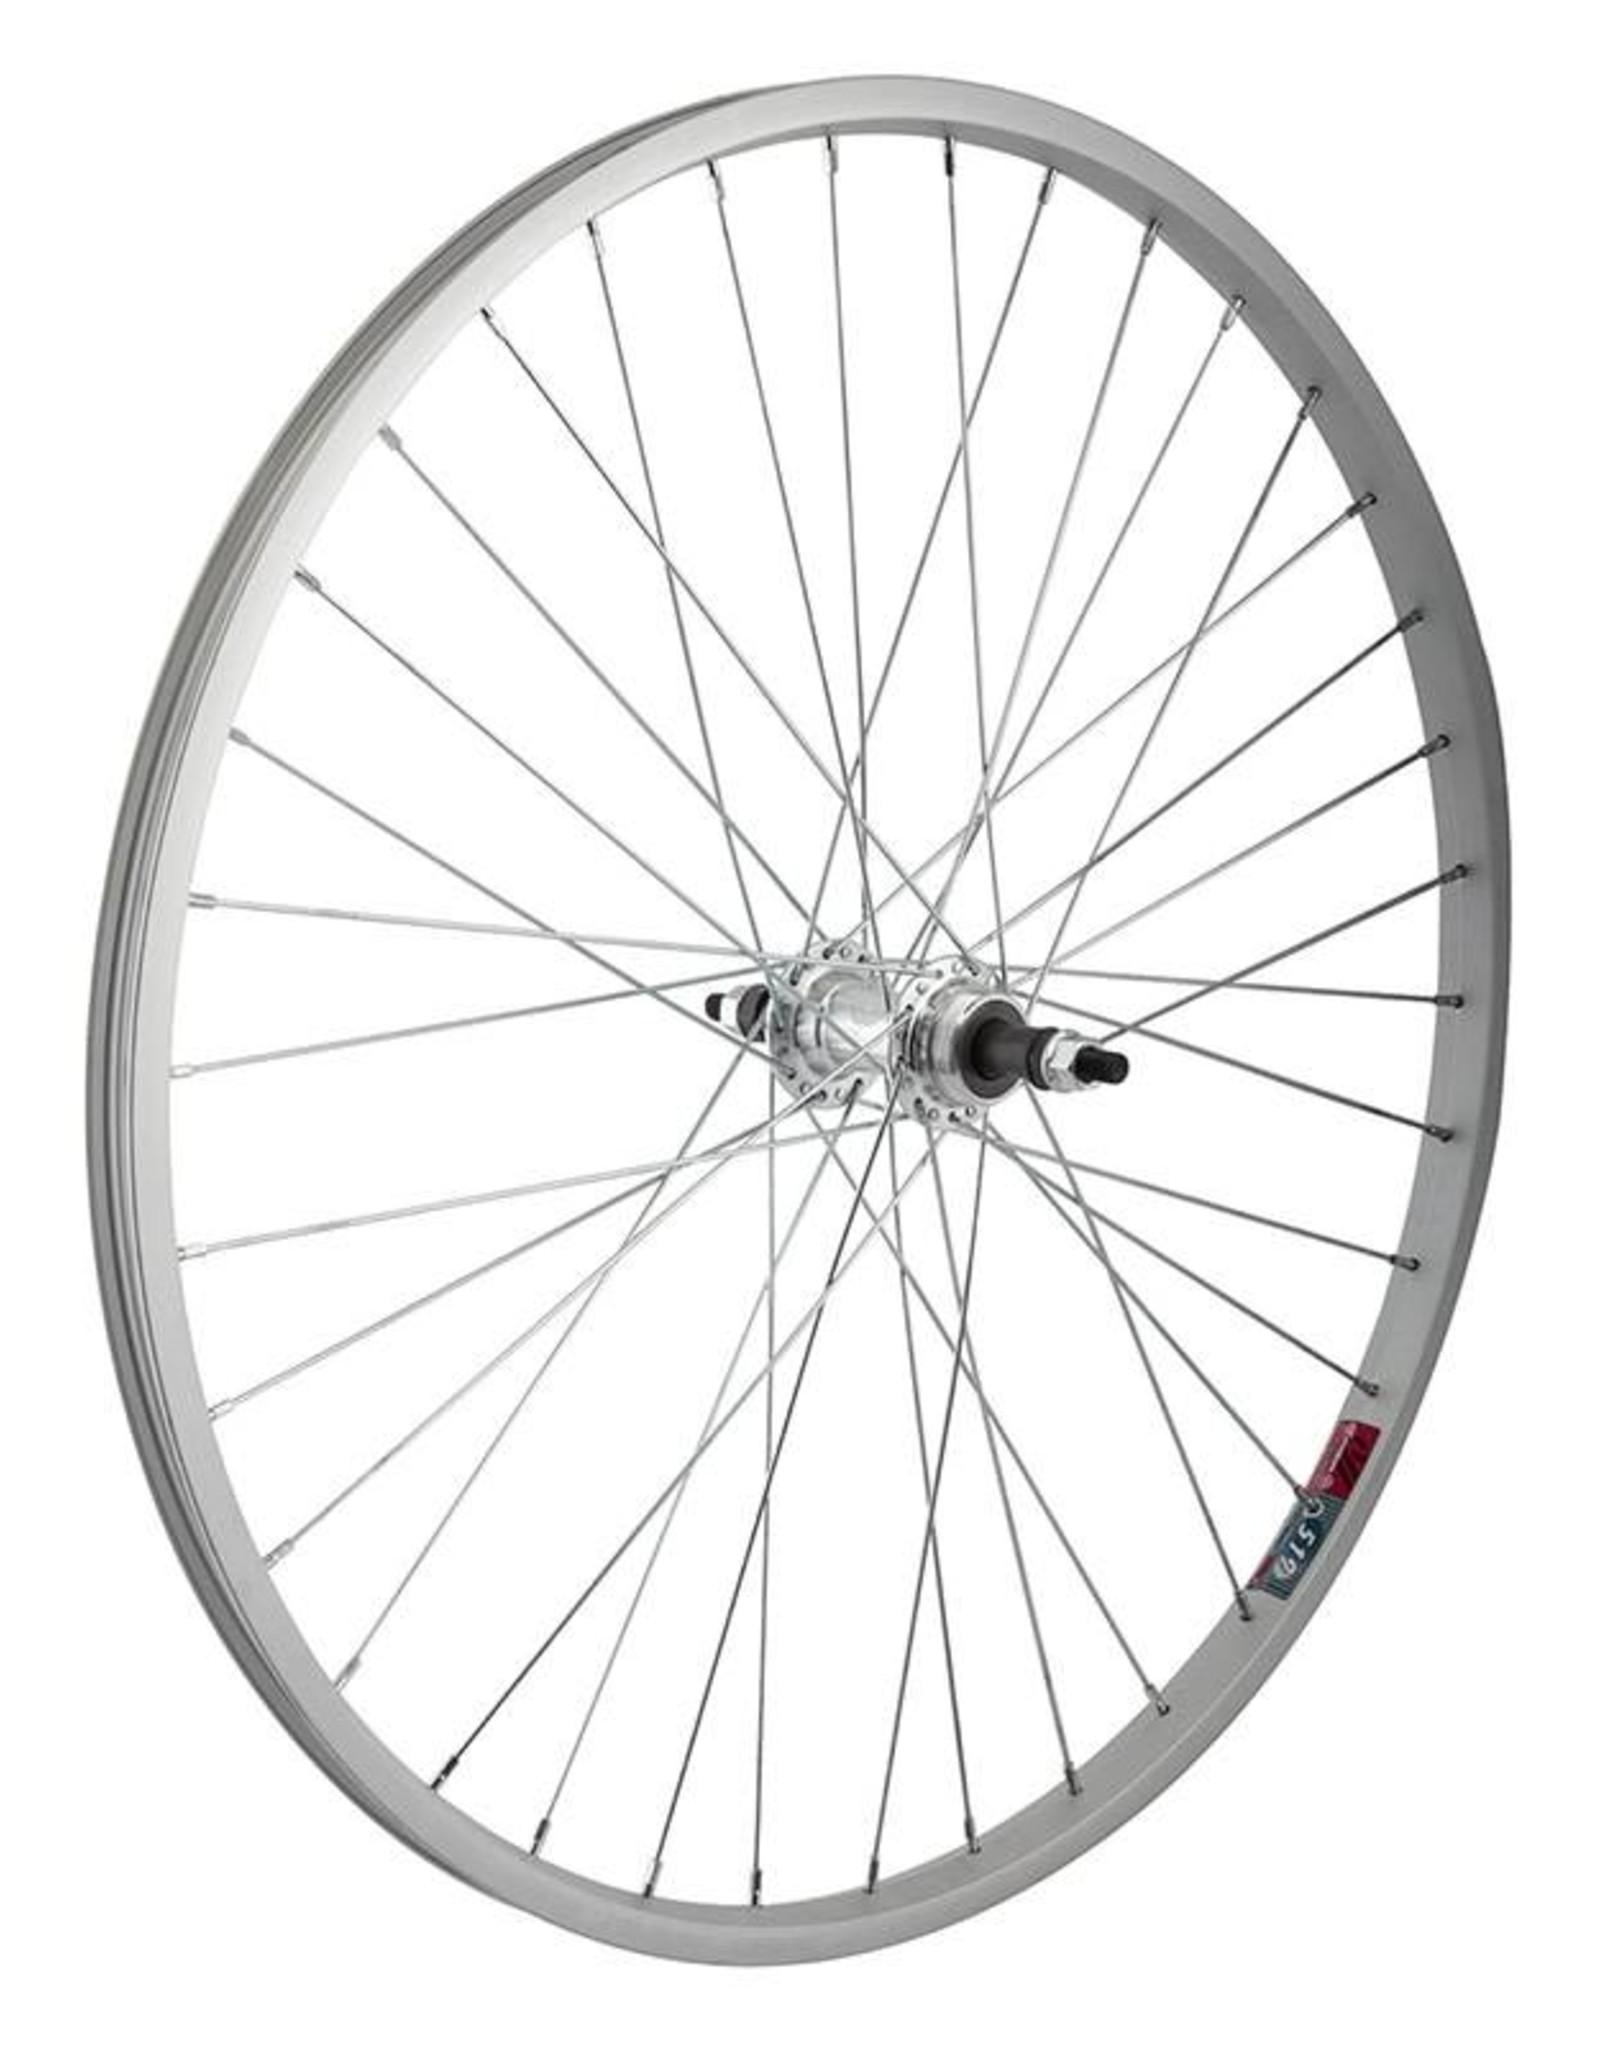 "Wheel Master 26"" Alloy Mountain Single Wall"